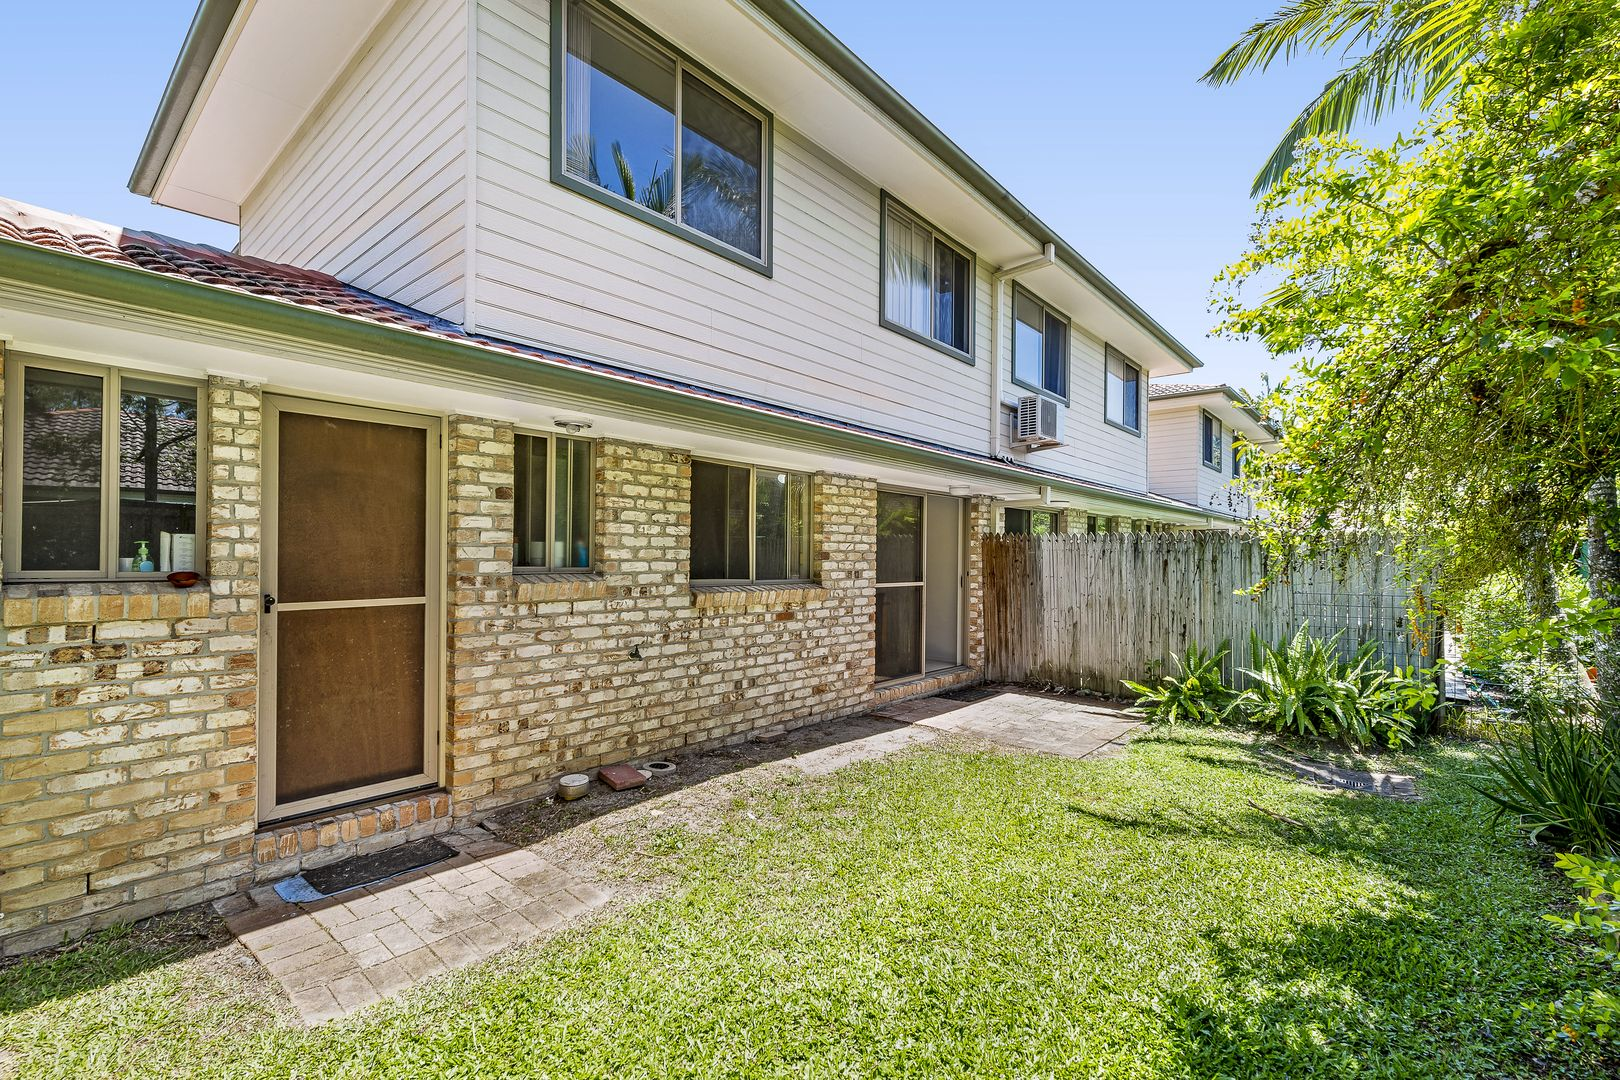 33/4 Koala Town Road, Upper Coomera QLD 4209, Image 2